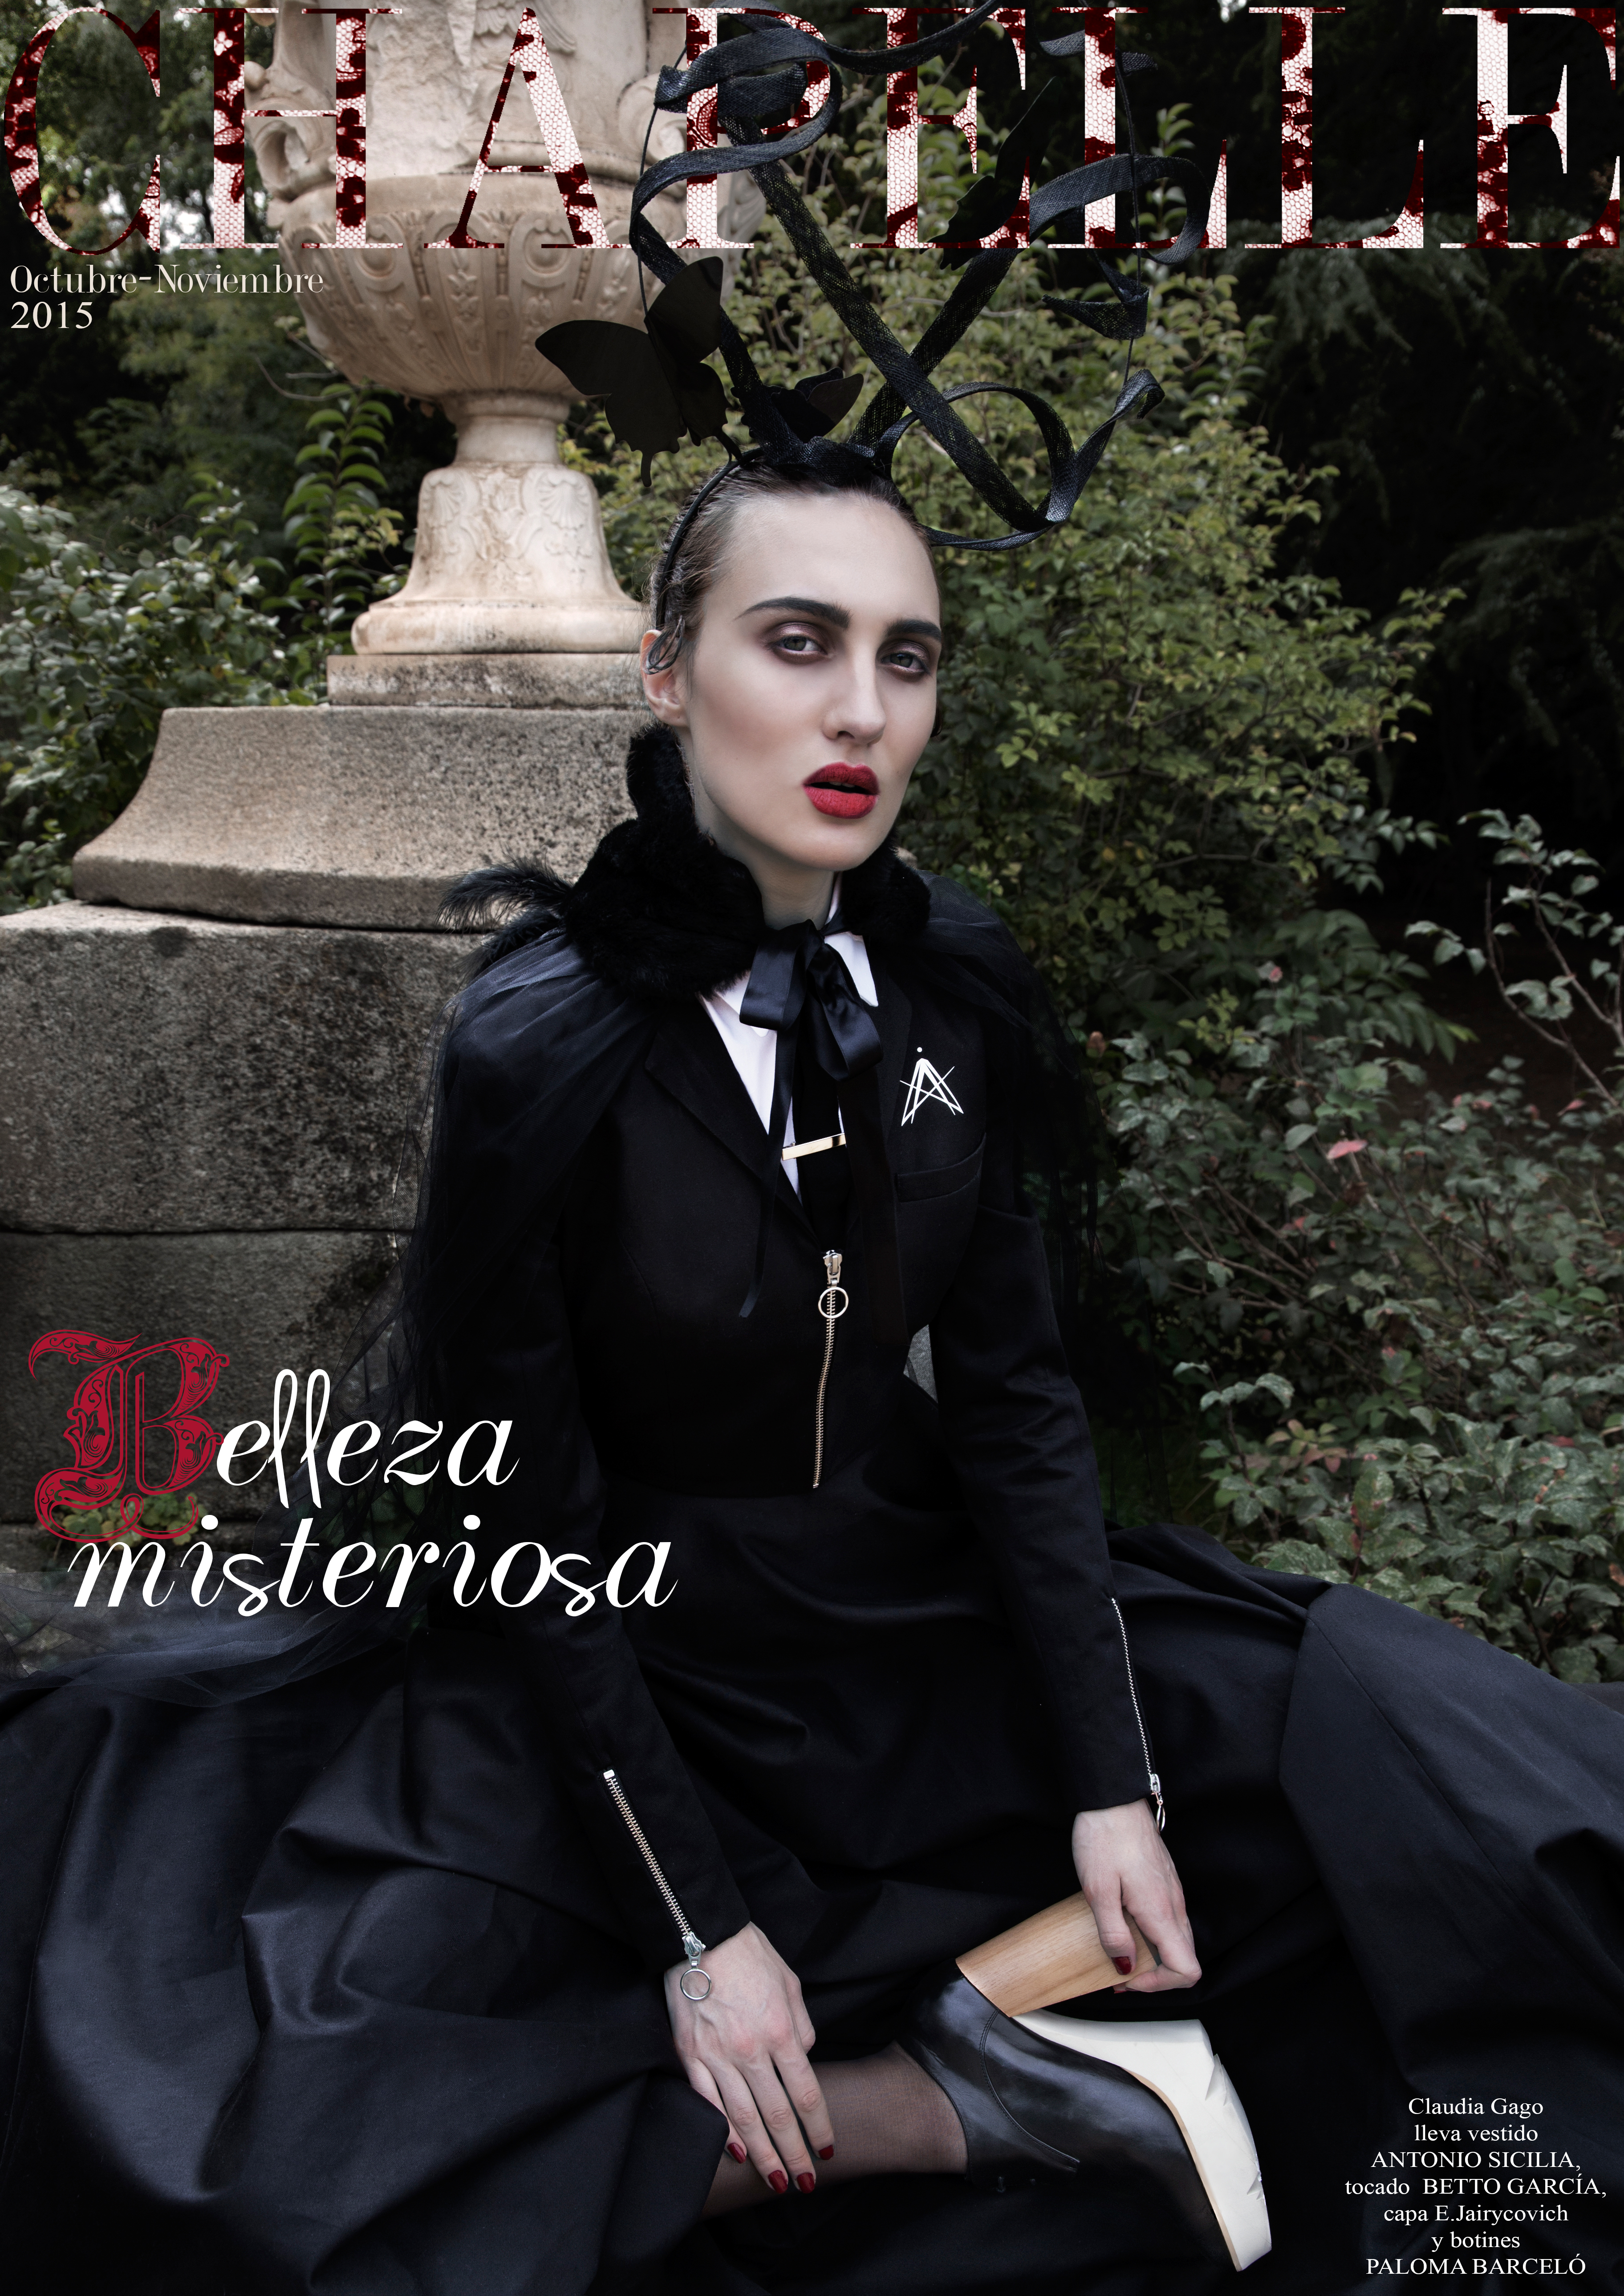 chapelle magazine valencia fashion bloggers spain revista moda diseño emergente barreira VLC, revistamoda valenciana numero online issue mysterious beauty